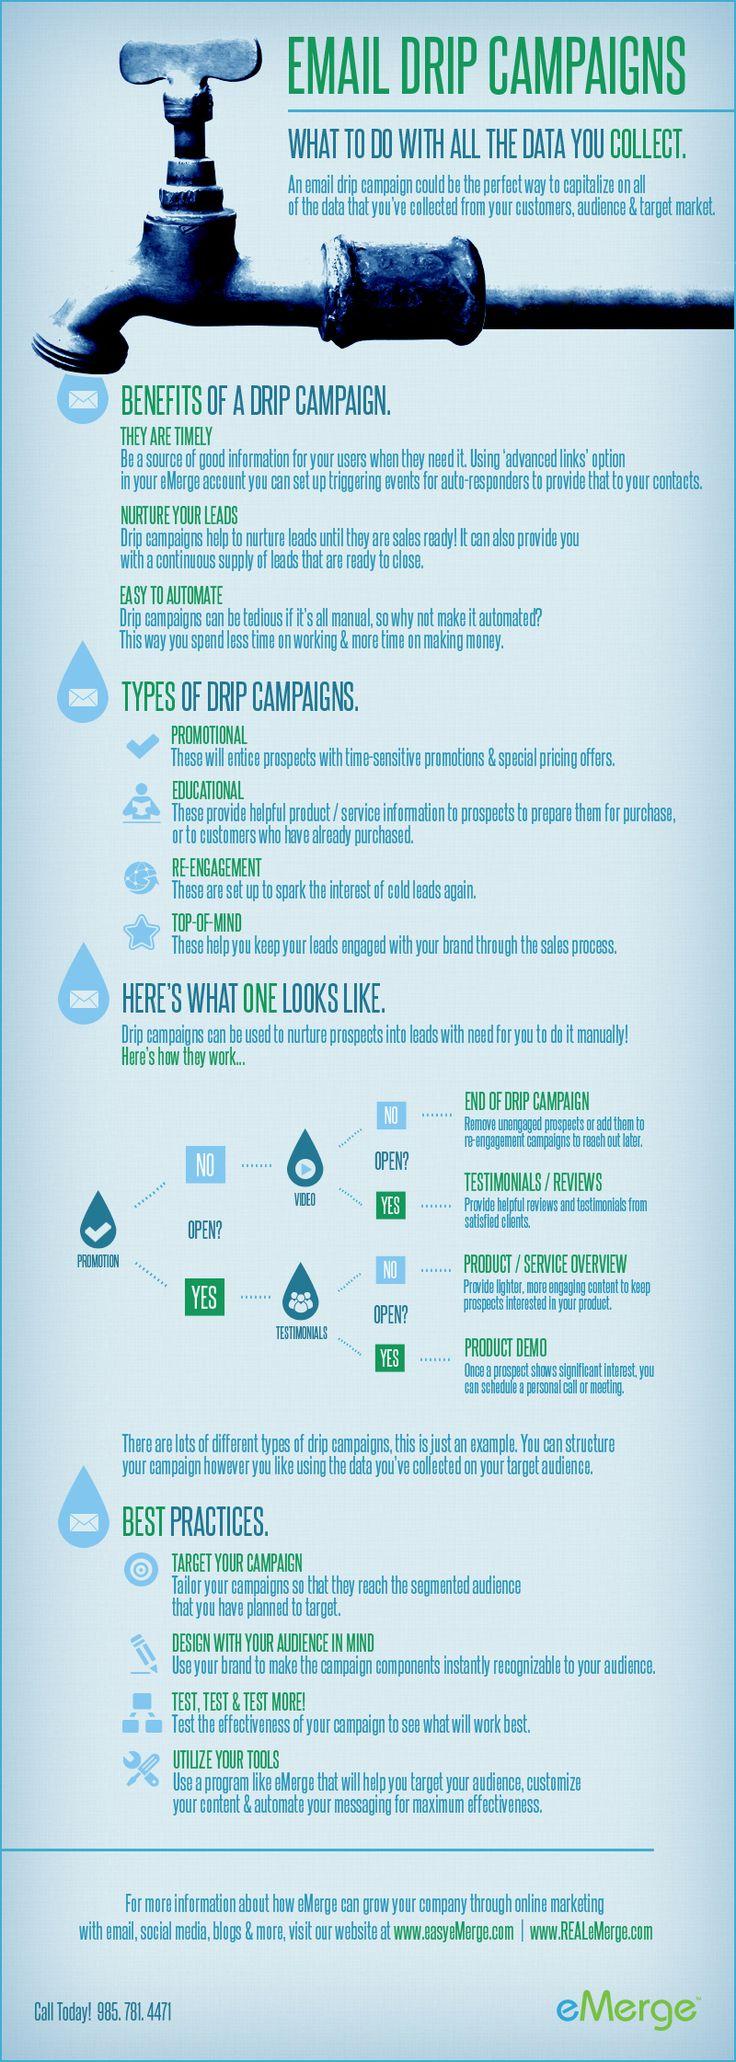 Email Drip Campaigns. Bespoke Social Media & Marketing